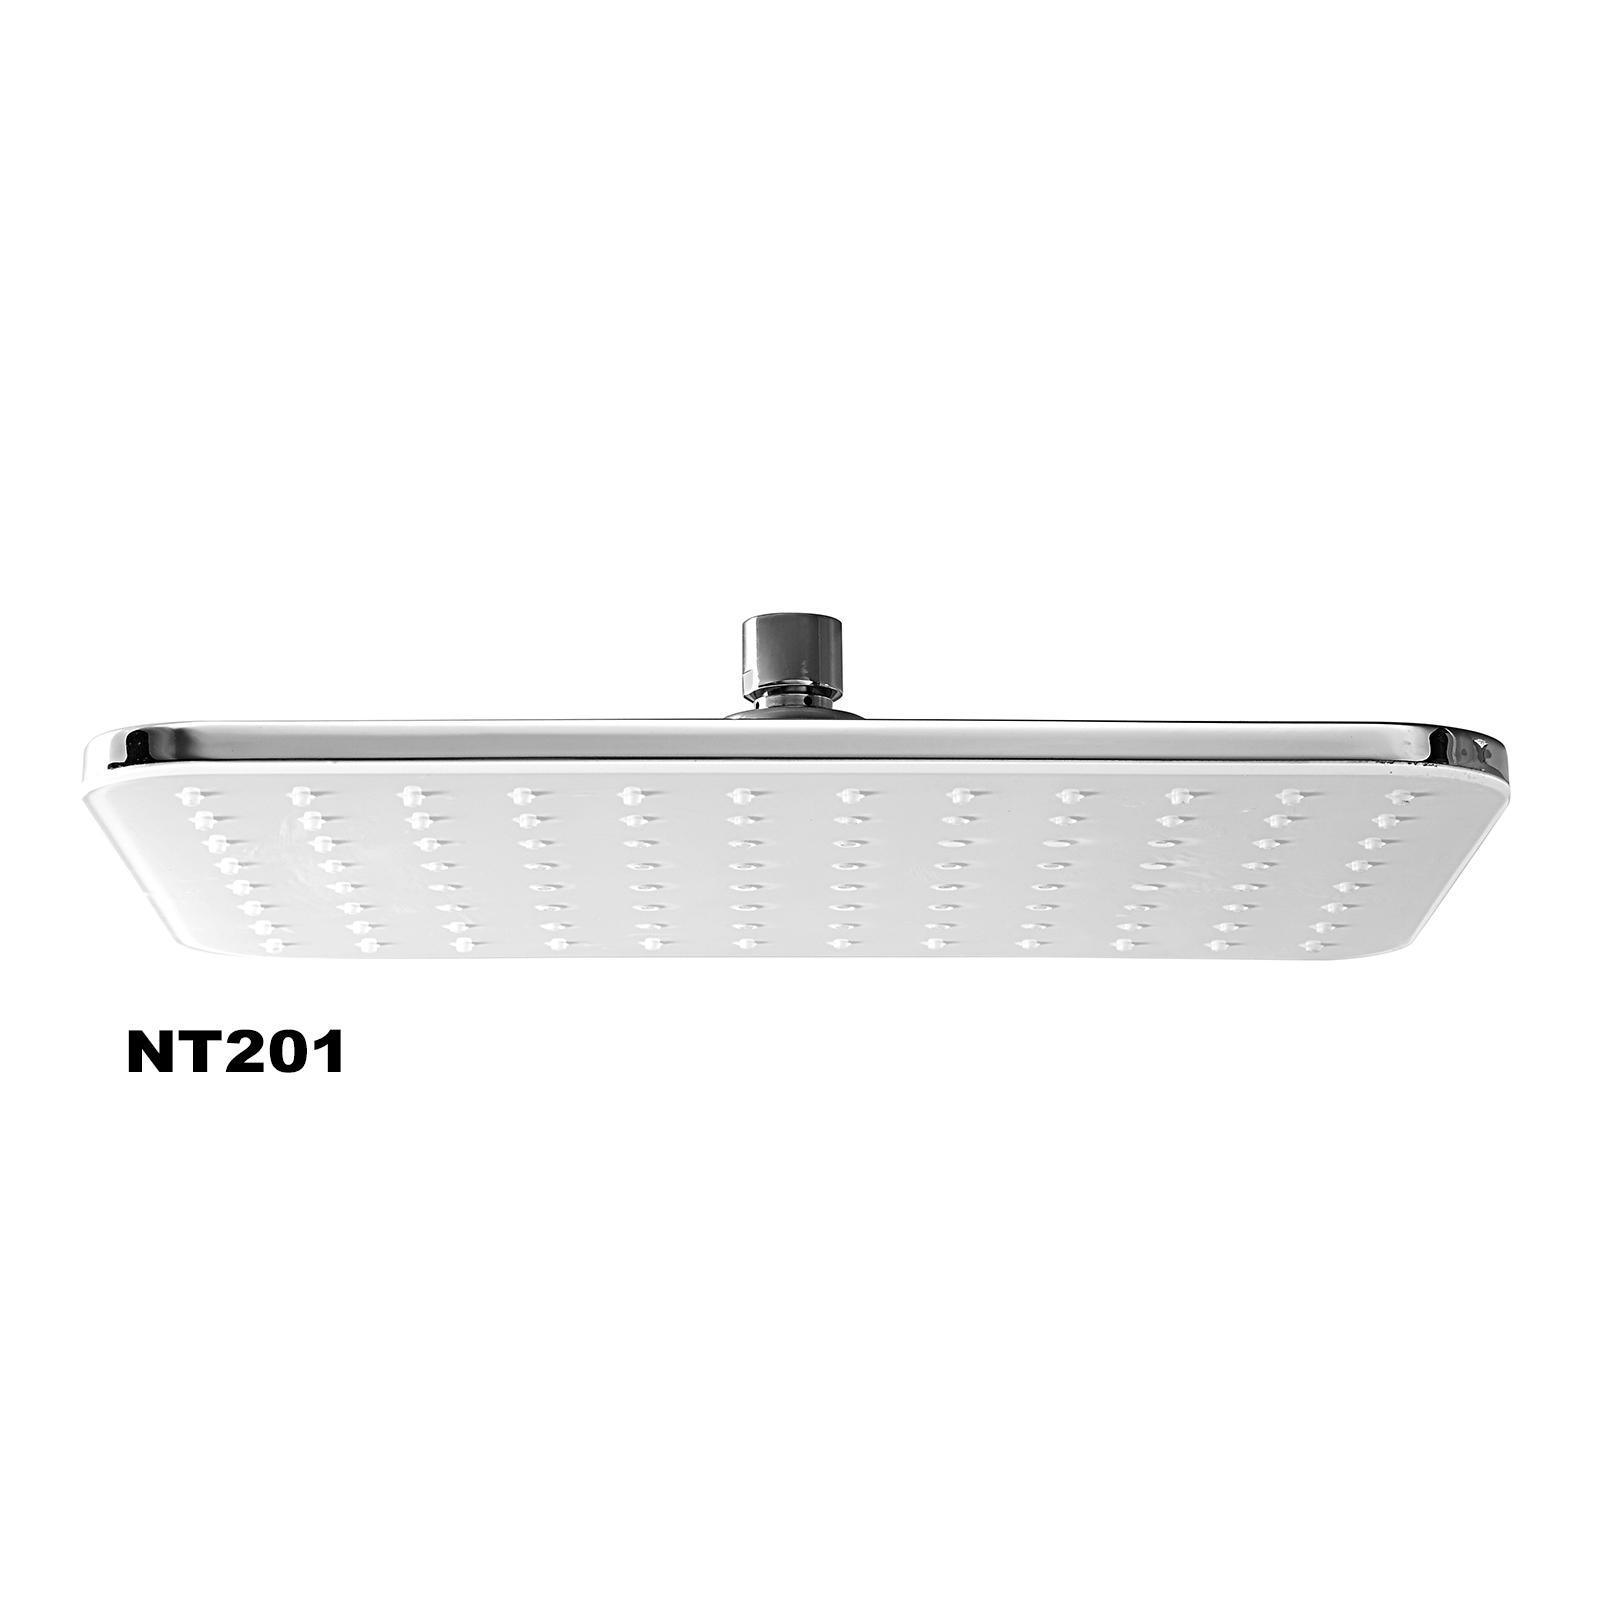 Duschkopf NT201